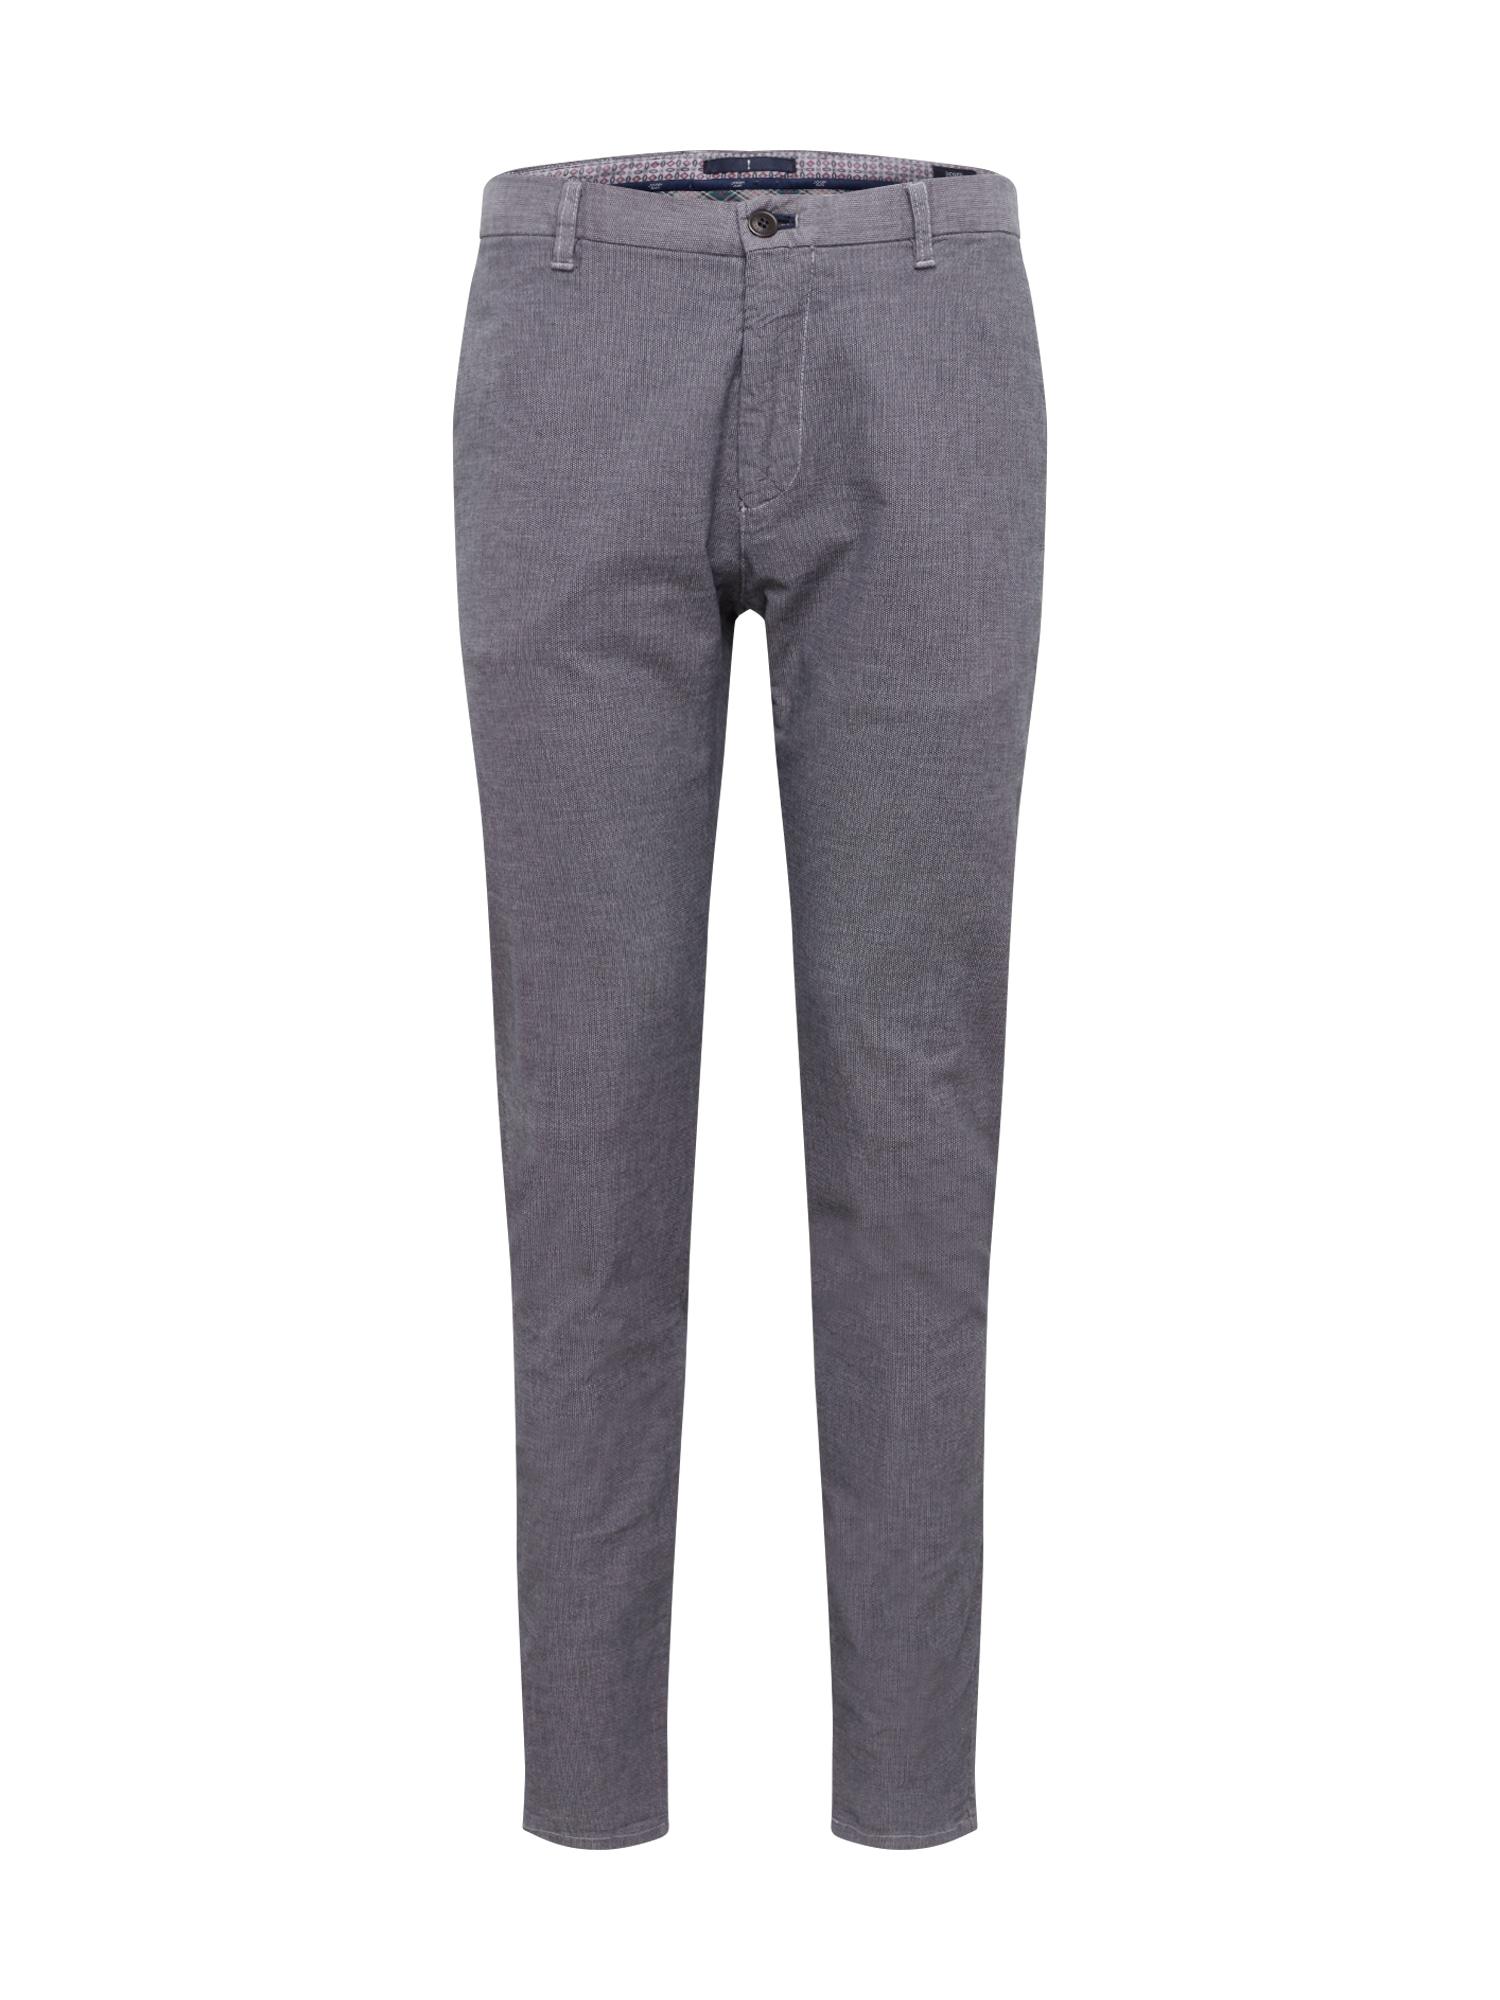 JOOP! Jeans Chino nohavice 'JJF-61Scott-D'  sivá